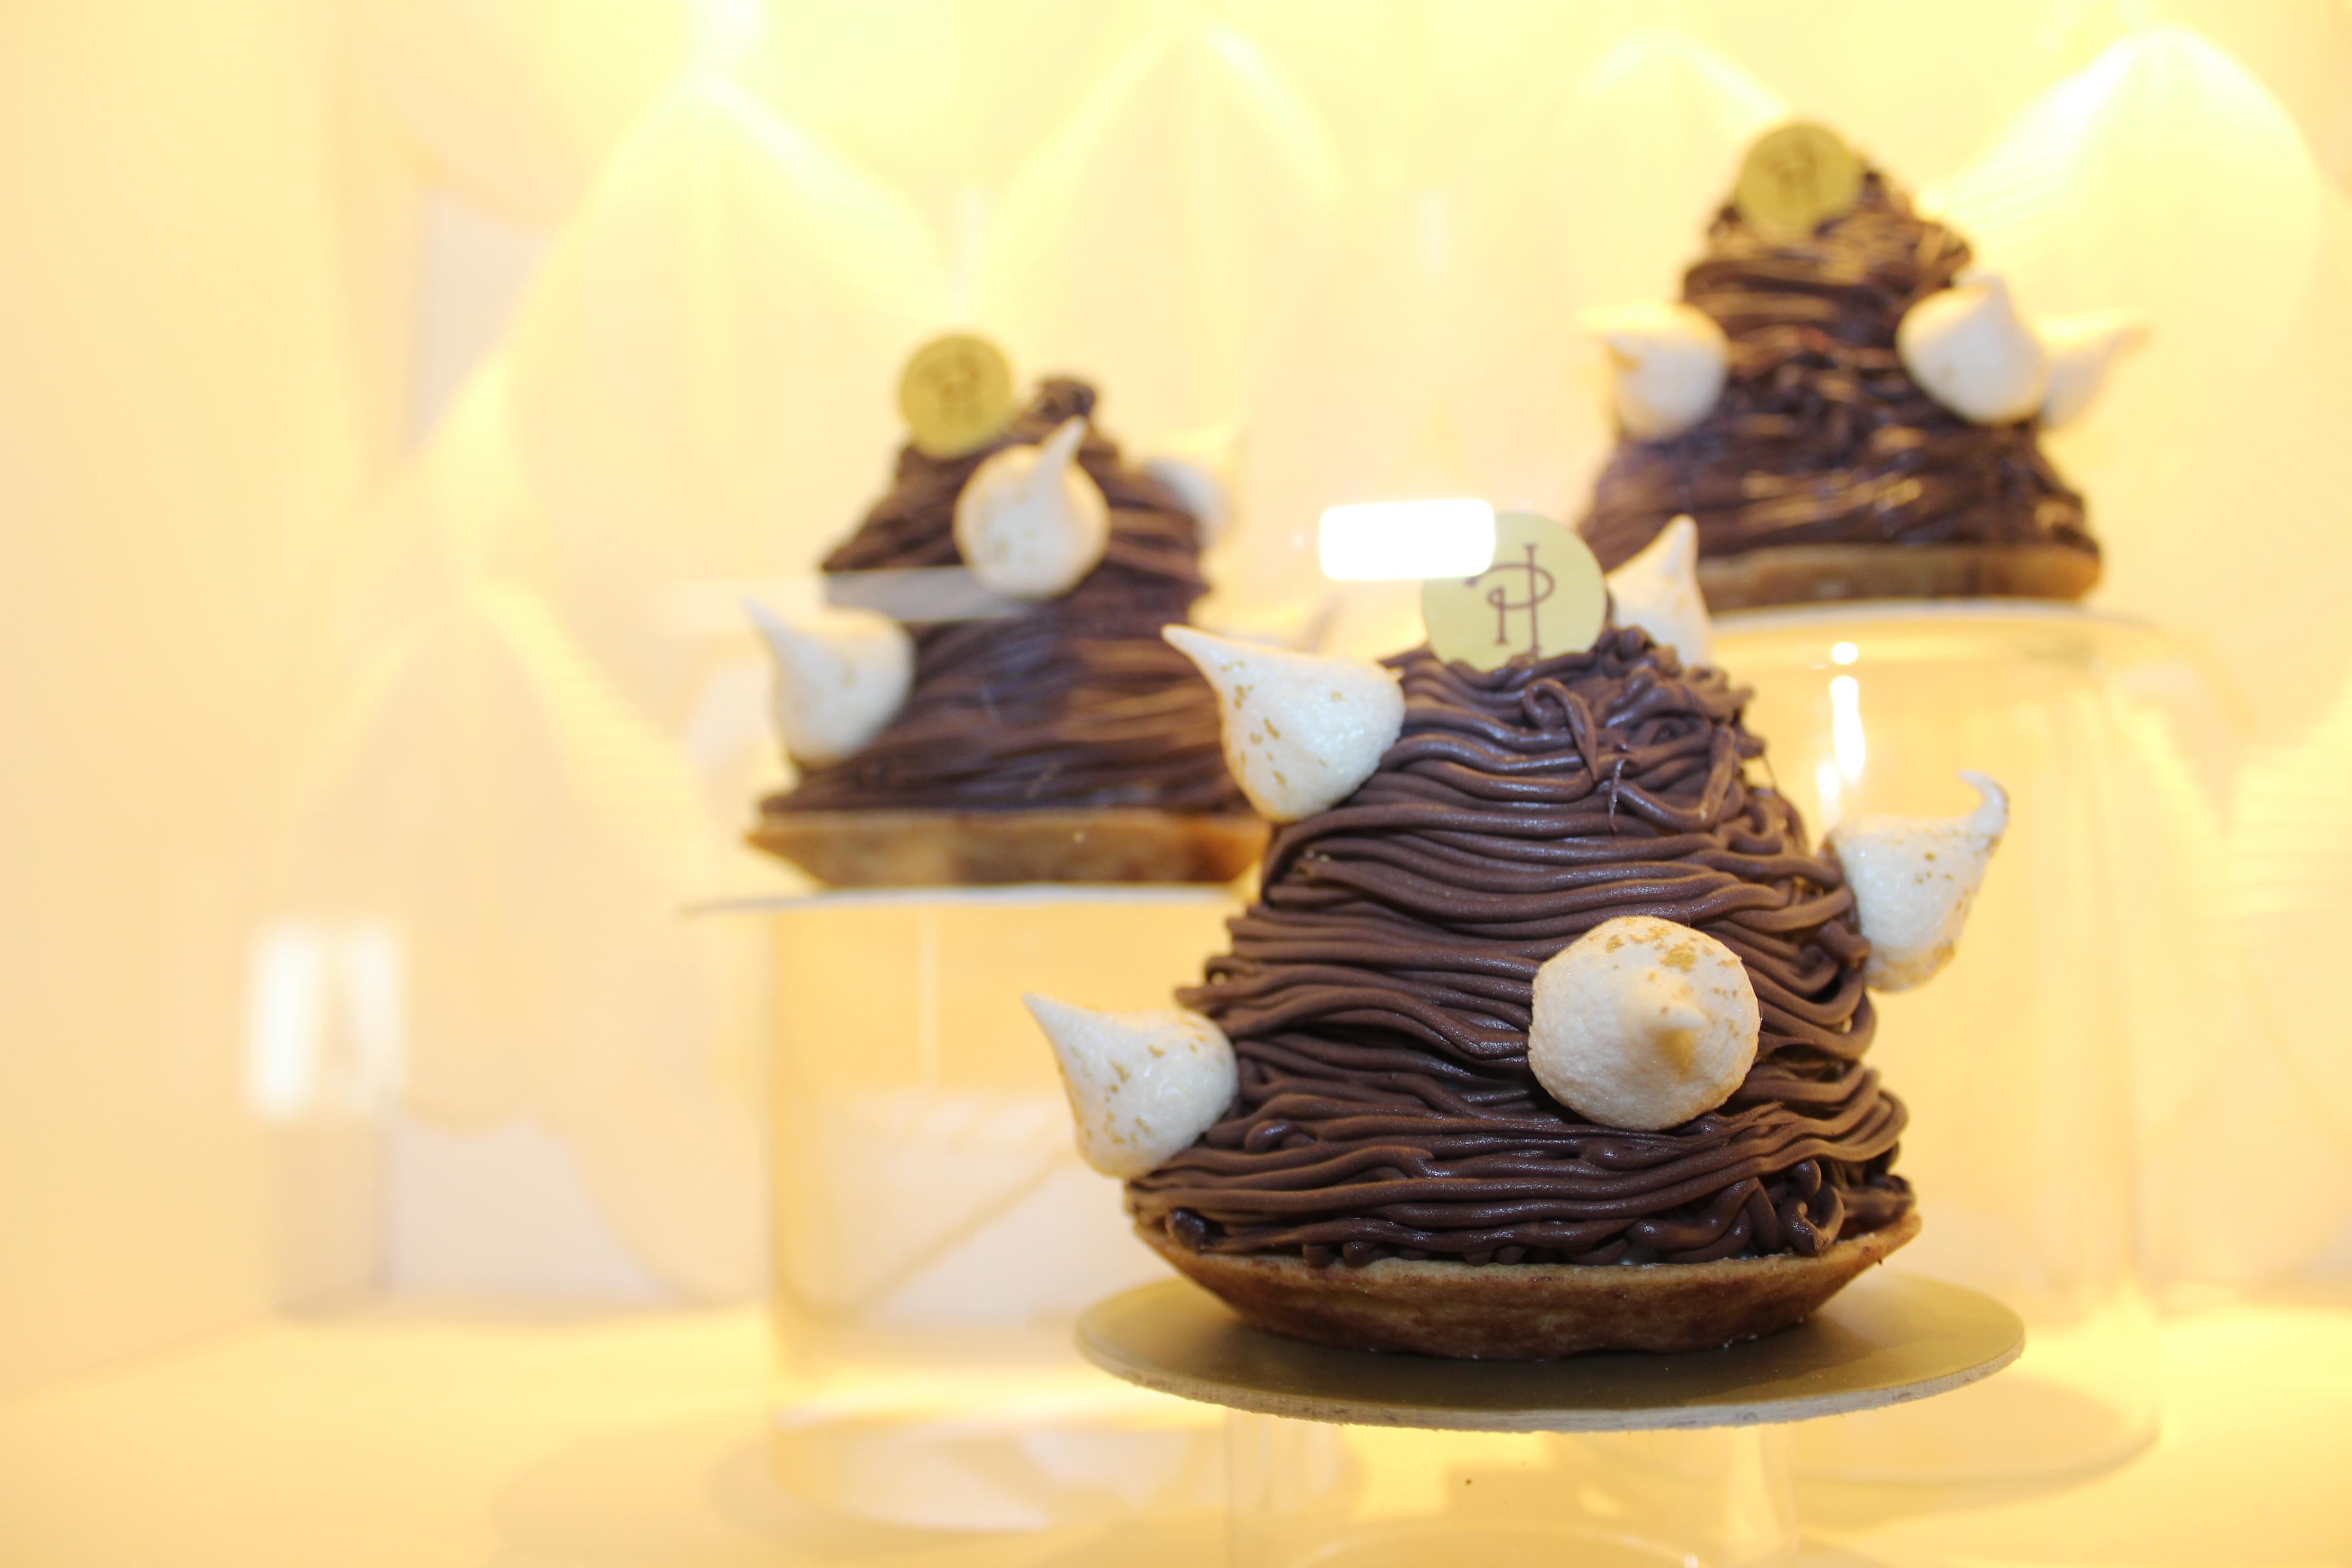 Tour & Tasting of The Best Pastries In Paris